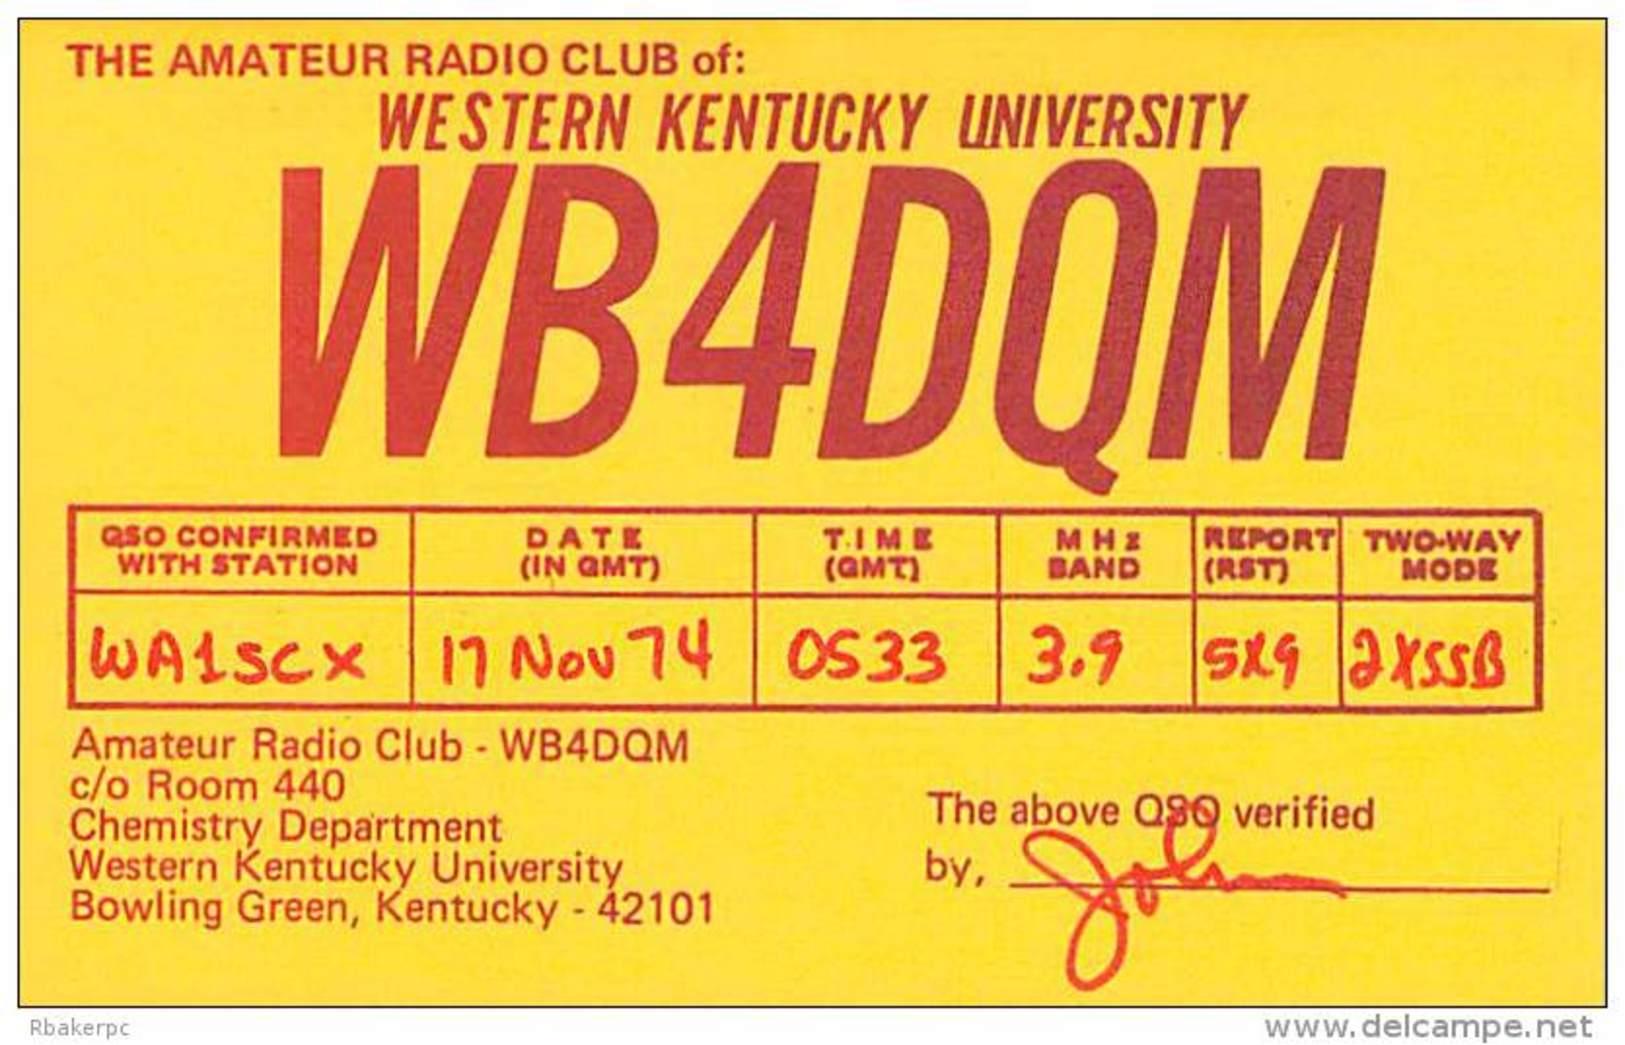 Amateur Radio QSL - WB4DQM - Western KY Univ Radio Club Bowling Green, KY -USA- 1974 - Radio Amateur